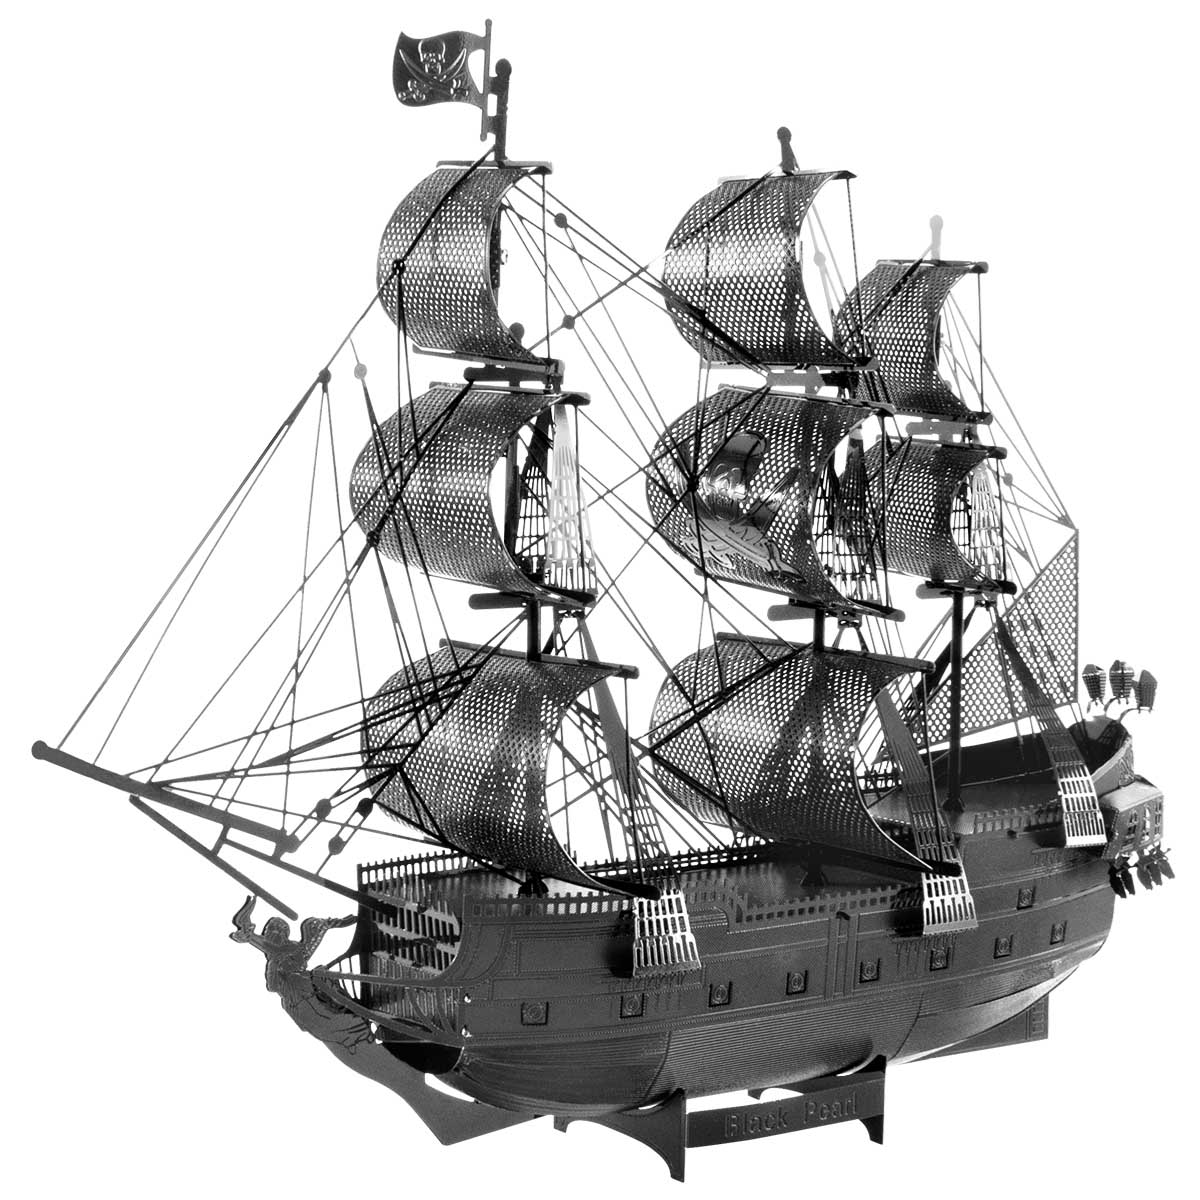 Black Pearl Ship - BLACK Boats 3D Puzzle